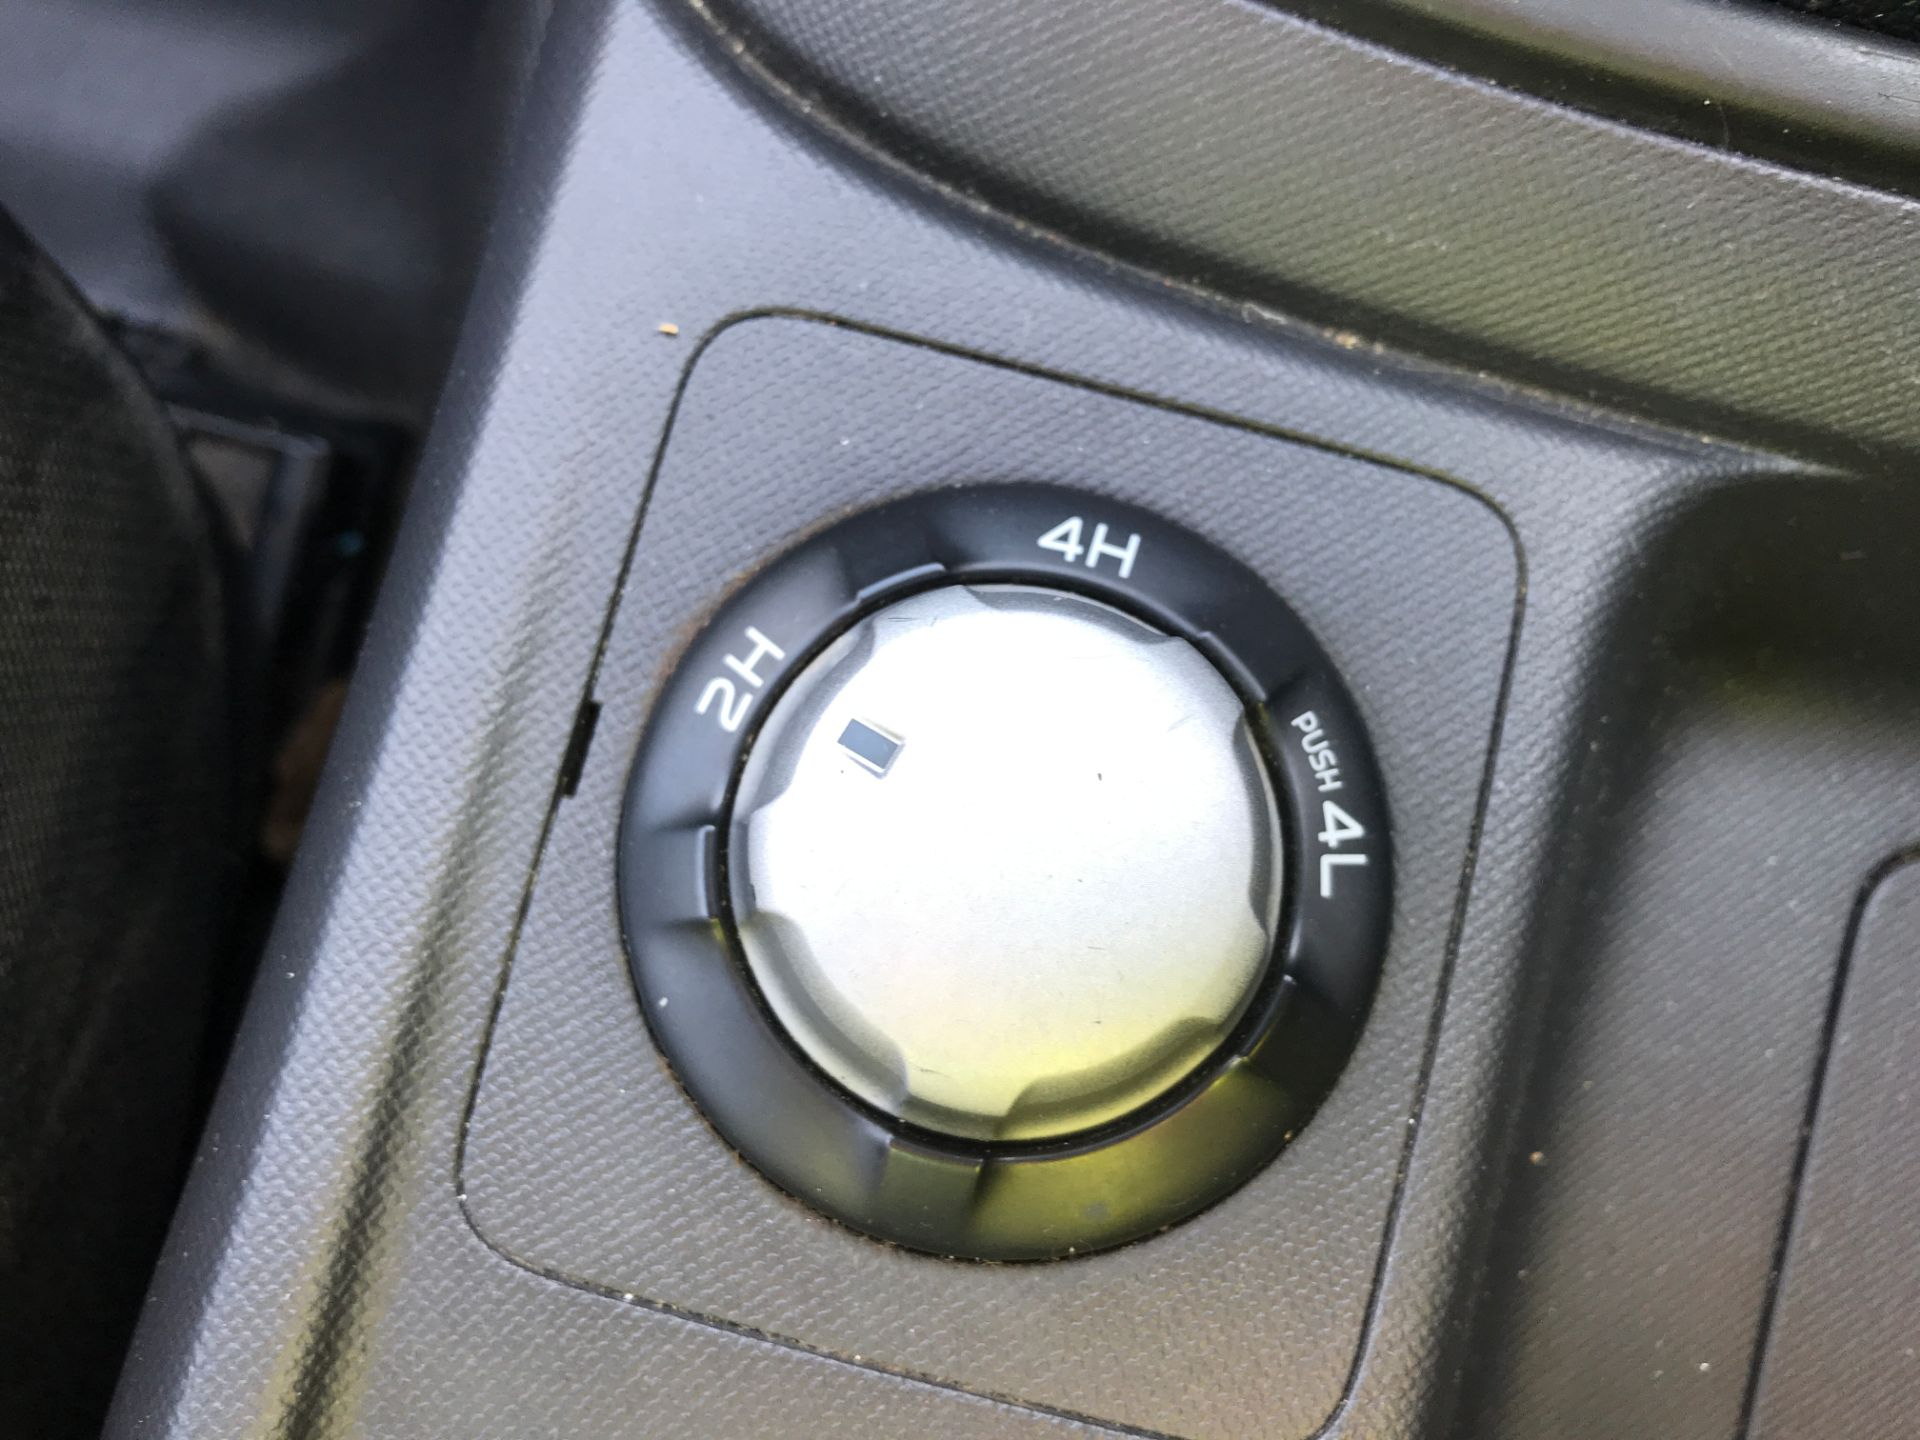 2015 Isuzu D-Max DOUBLE CAB 4X4 2.5TD 163PS EURO 5, AIR CON (YB65DJF) Image 22